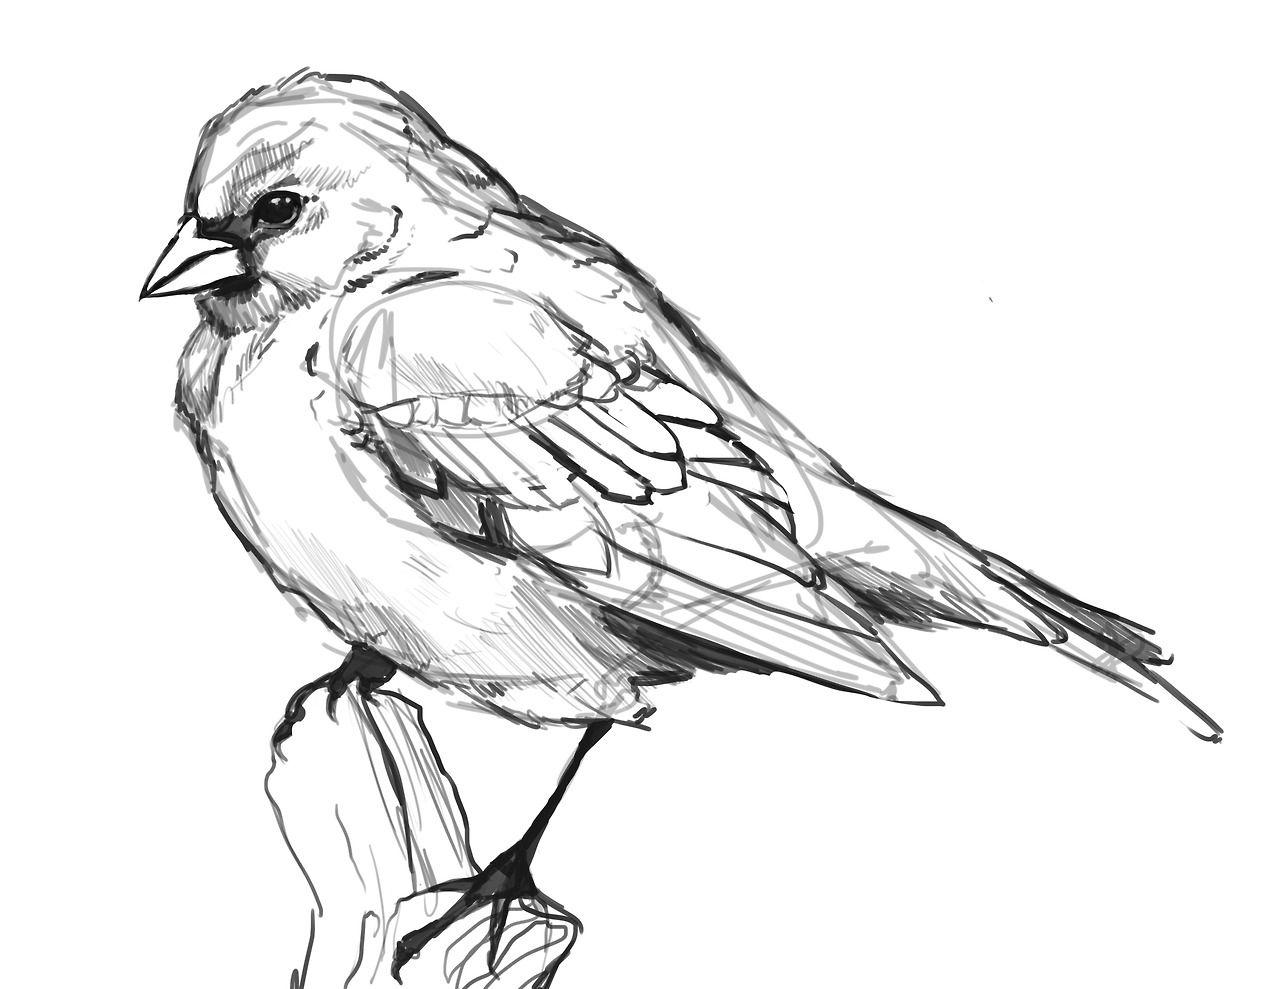 Tumblr Mm6yapbenf1sprvtjo3 1280 Jpg 1280 989 Vogels Tekenen Dieren Illustratie